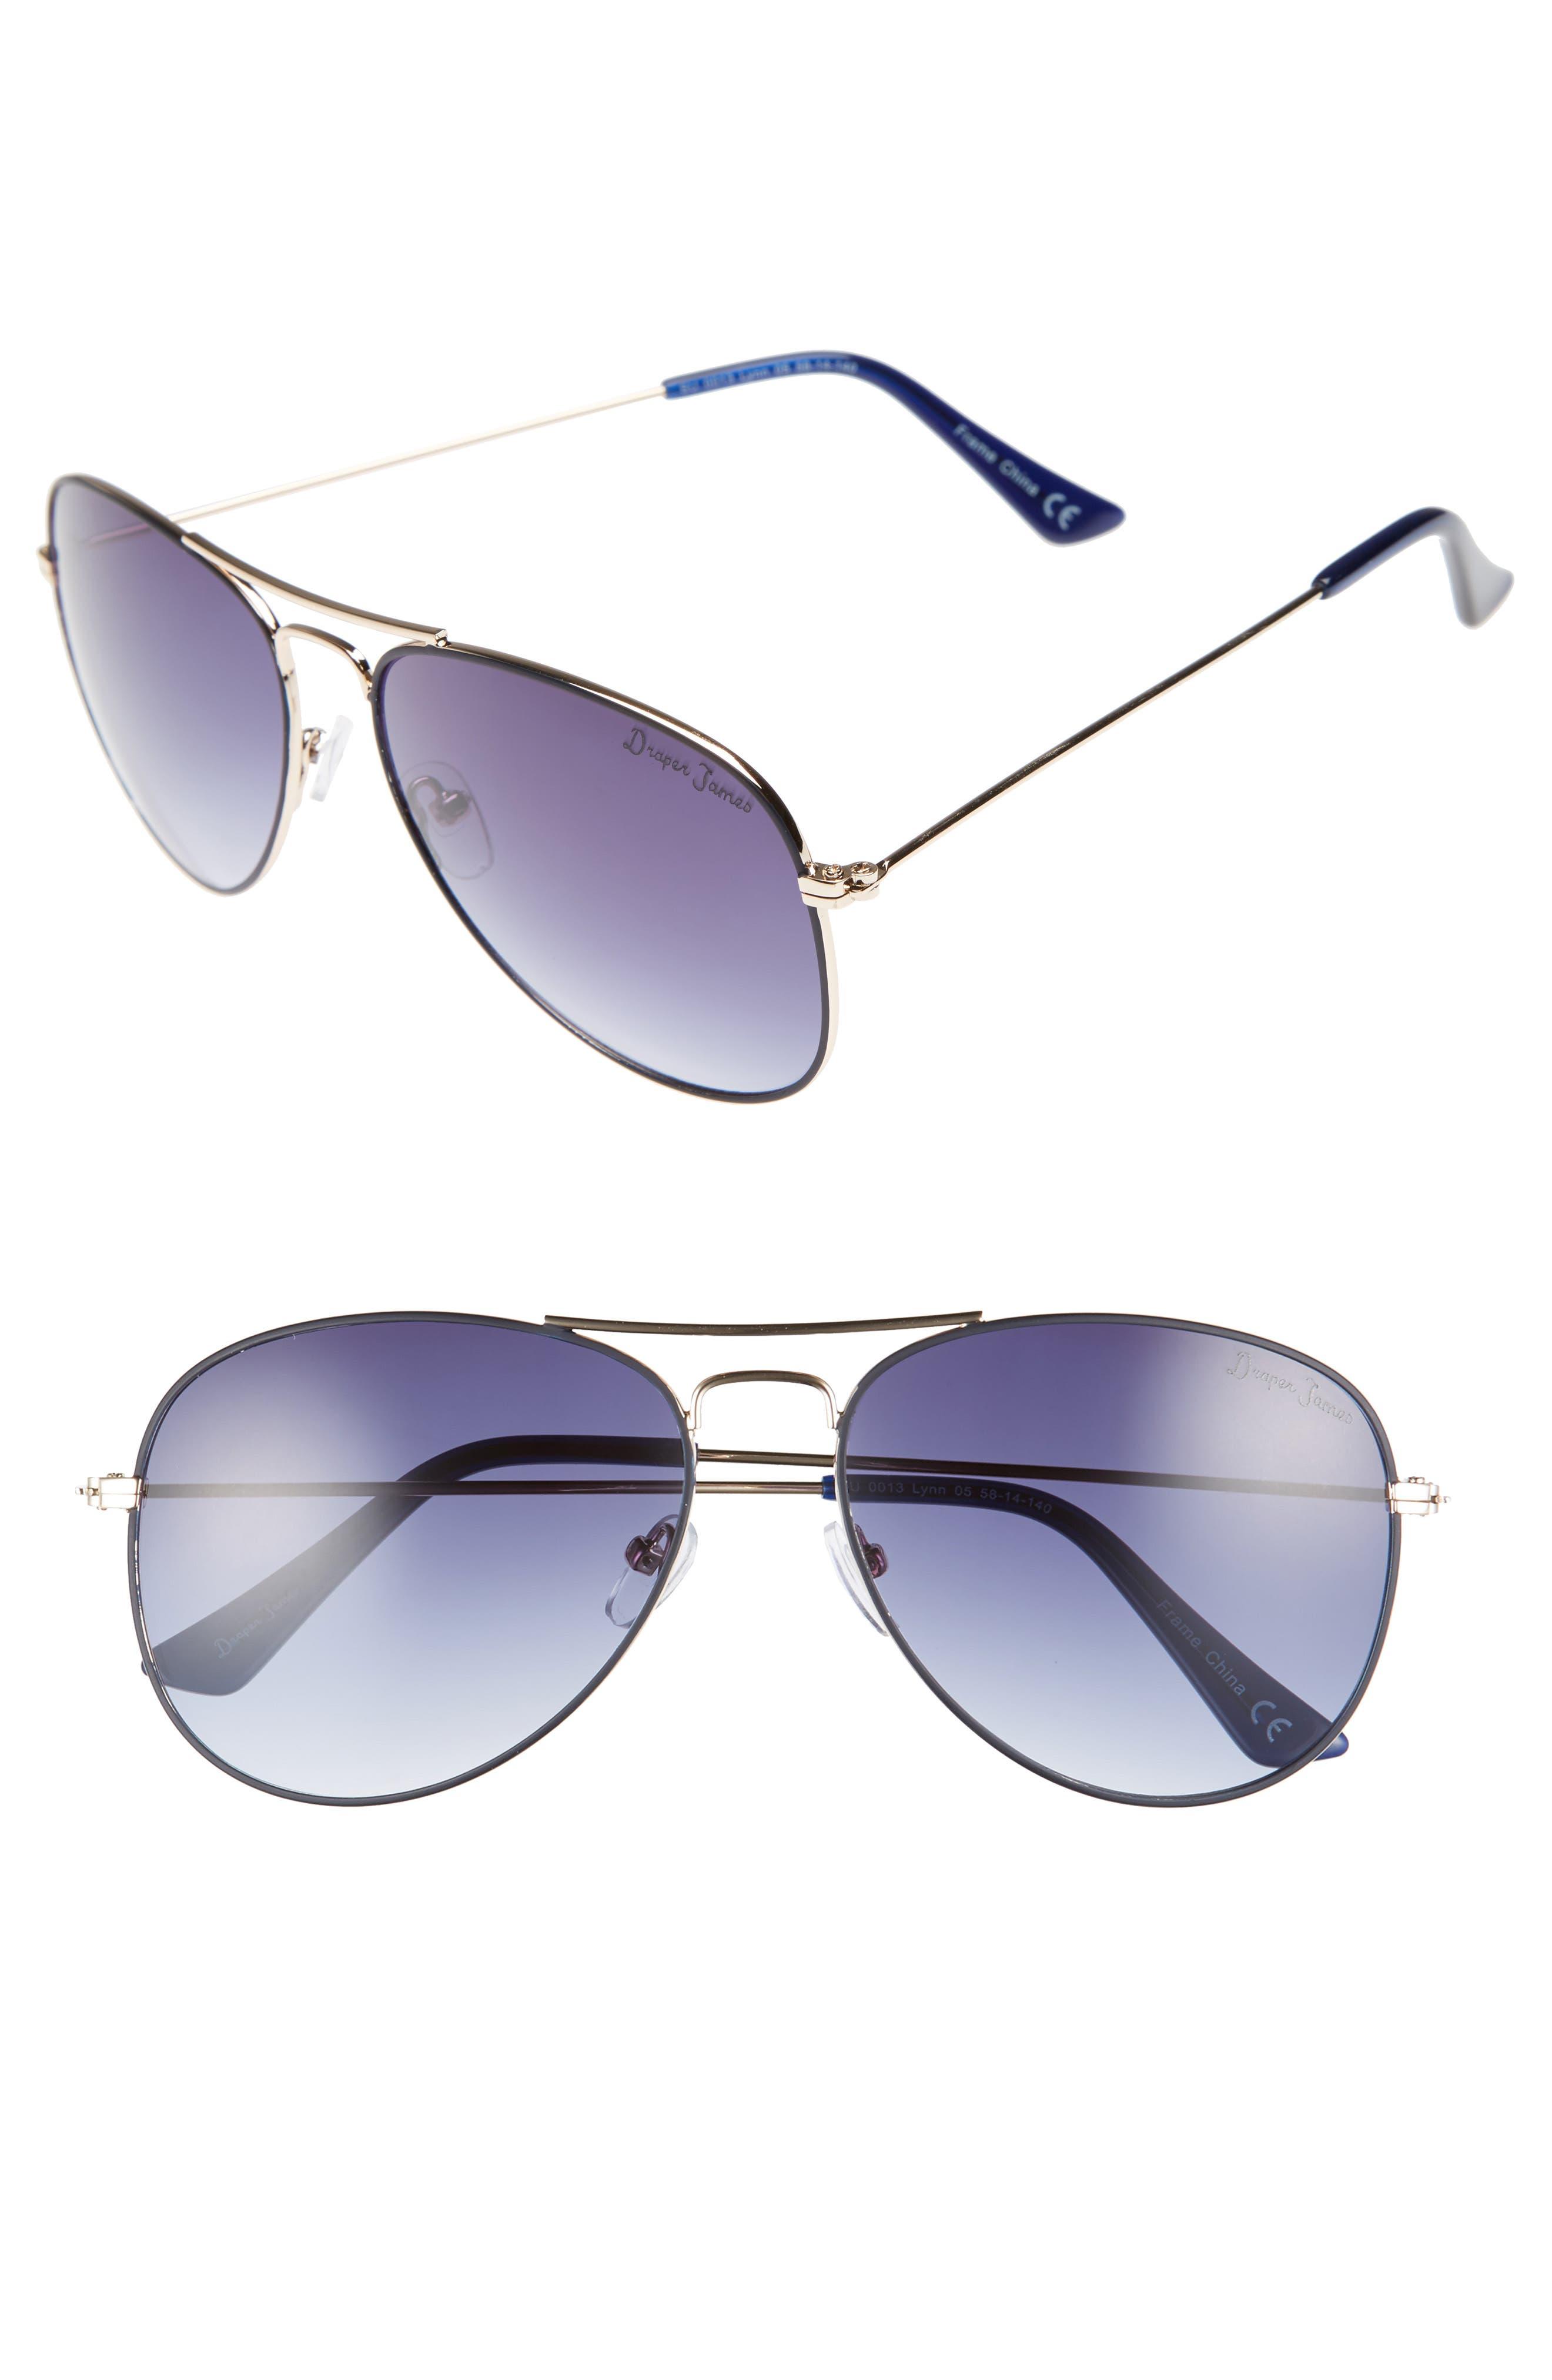 DRAPER JAMES 58mm Gradient Aviator Sunglasses